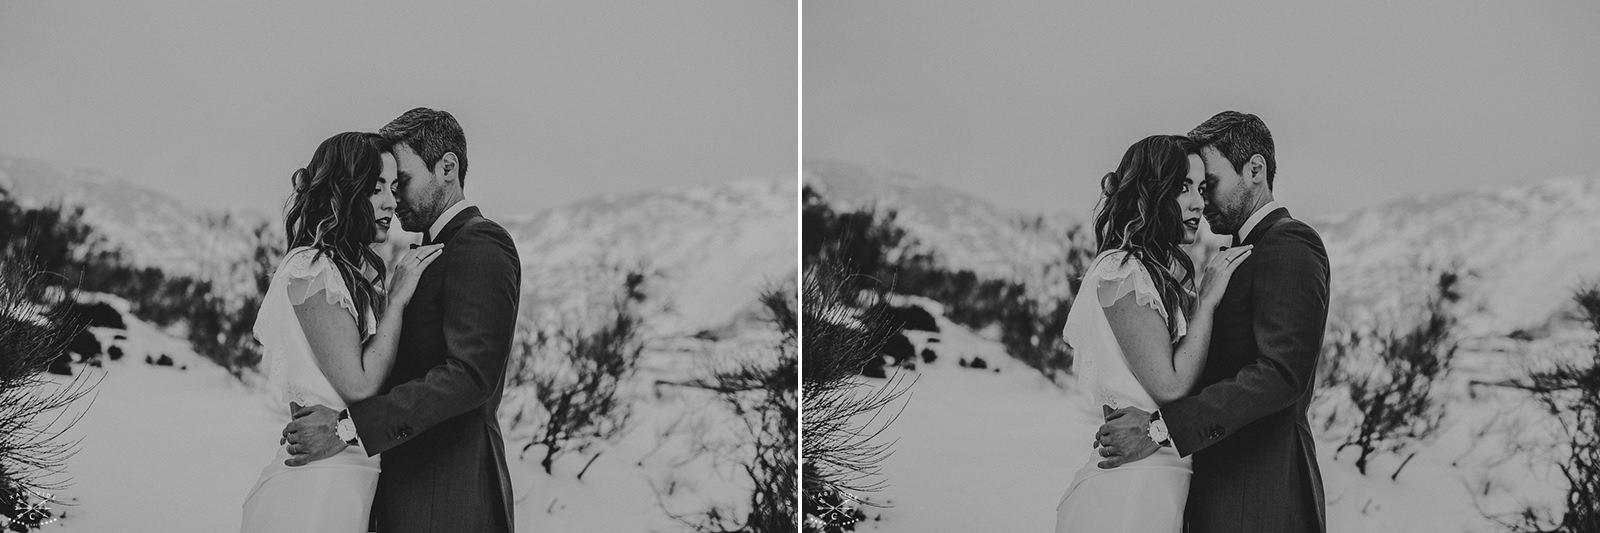 fotógrafo de bodas en bilbao-10